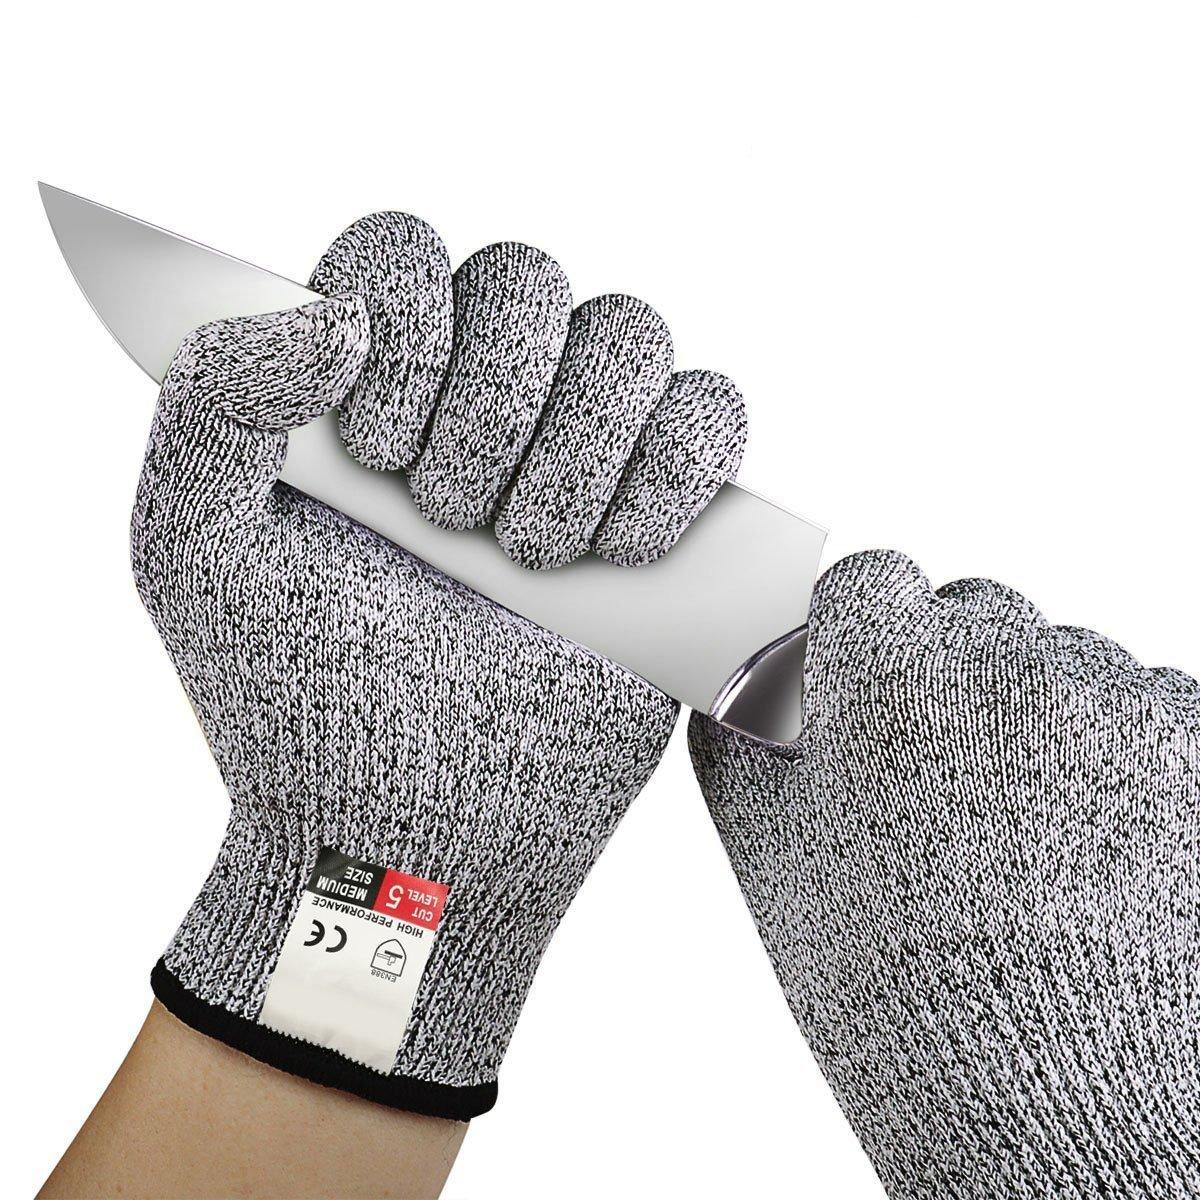 SAYGOGO Cut Resistant Gloves - High Performance Level 5 Protection, Food Grade. Size Medium by SAYGOGO